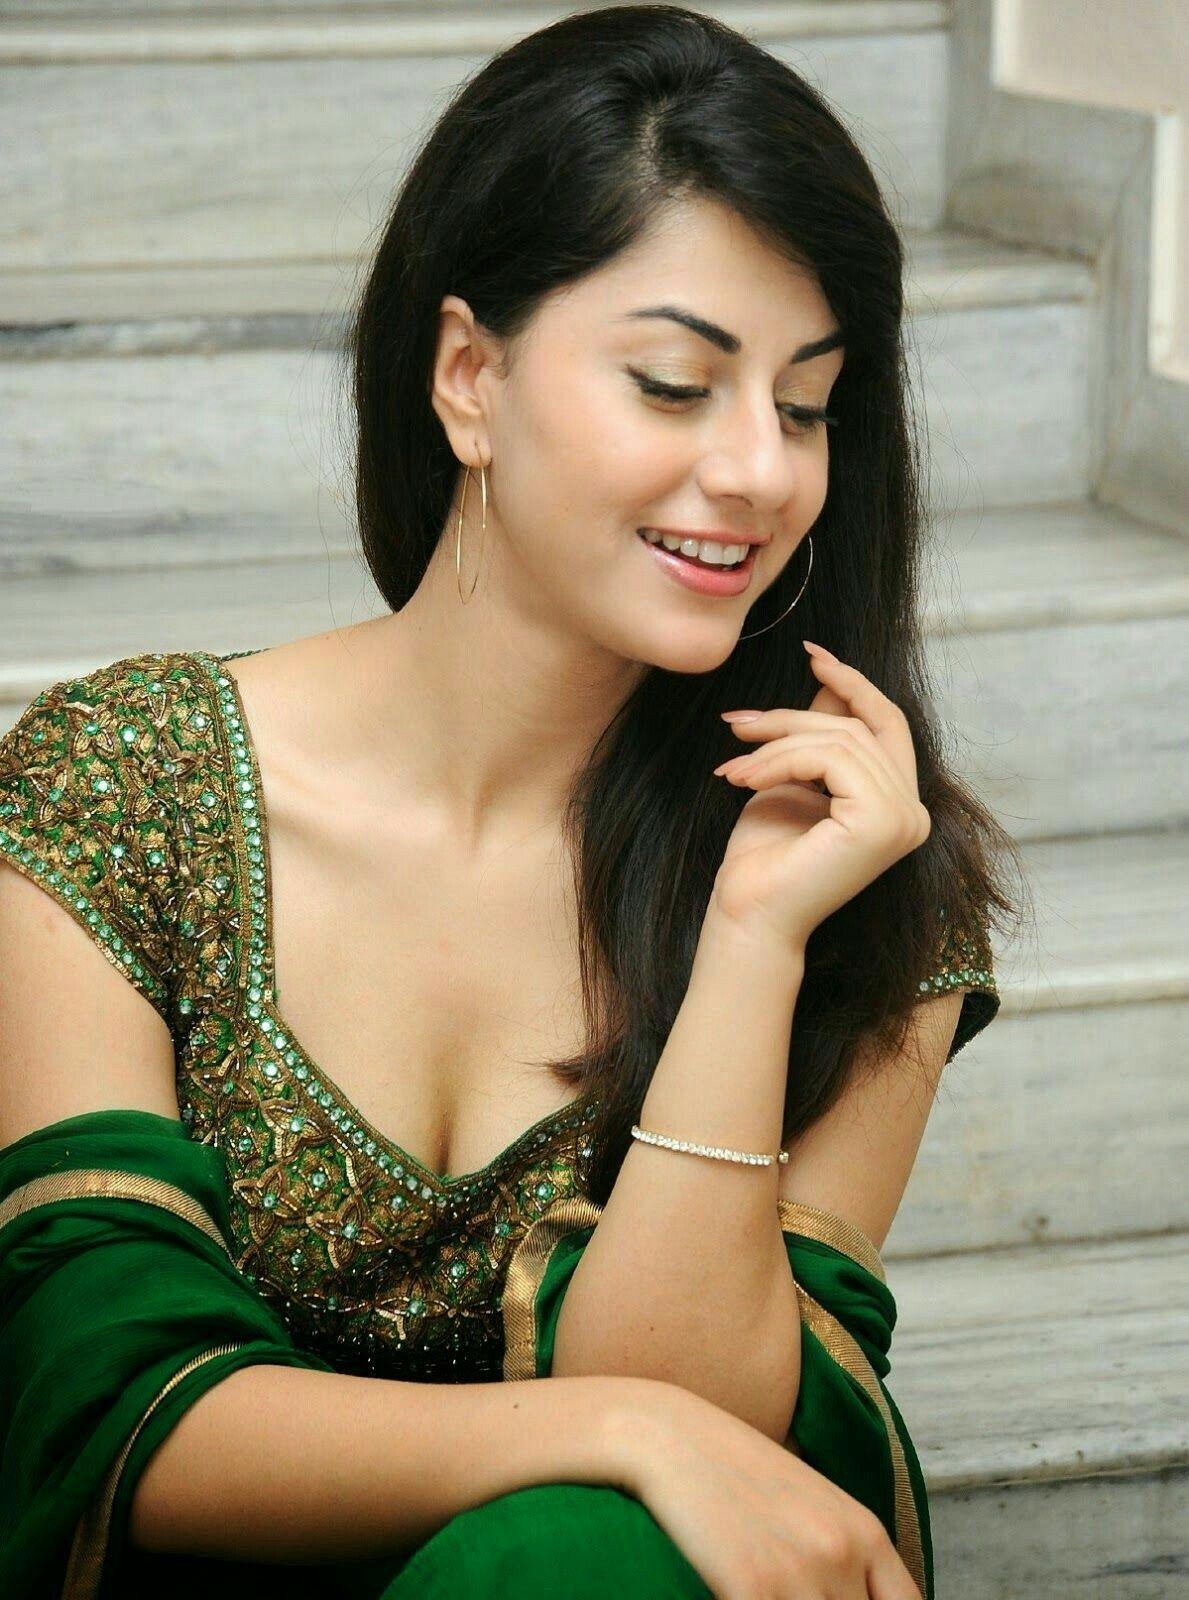 Rishika jairath pure pinterest indian beauty india beauty and